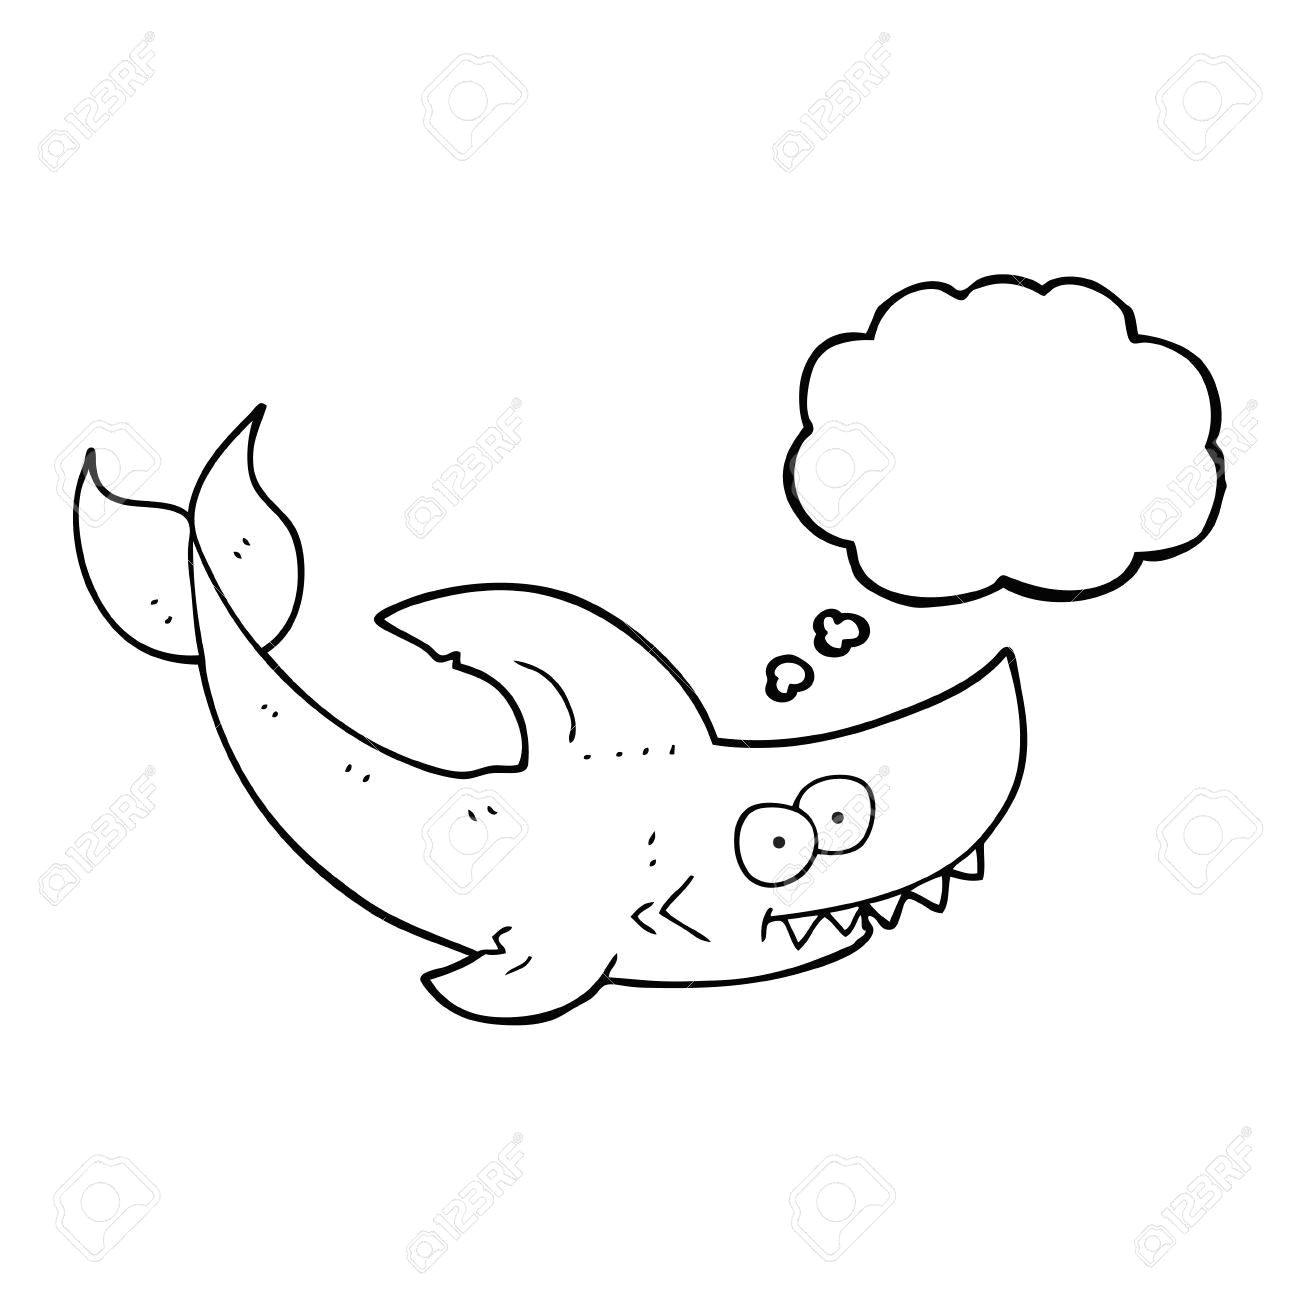 Drawing Cartoons Shark Freehand Drawn thought Bubble Cartoon Shark Royalty Free Cliparts